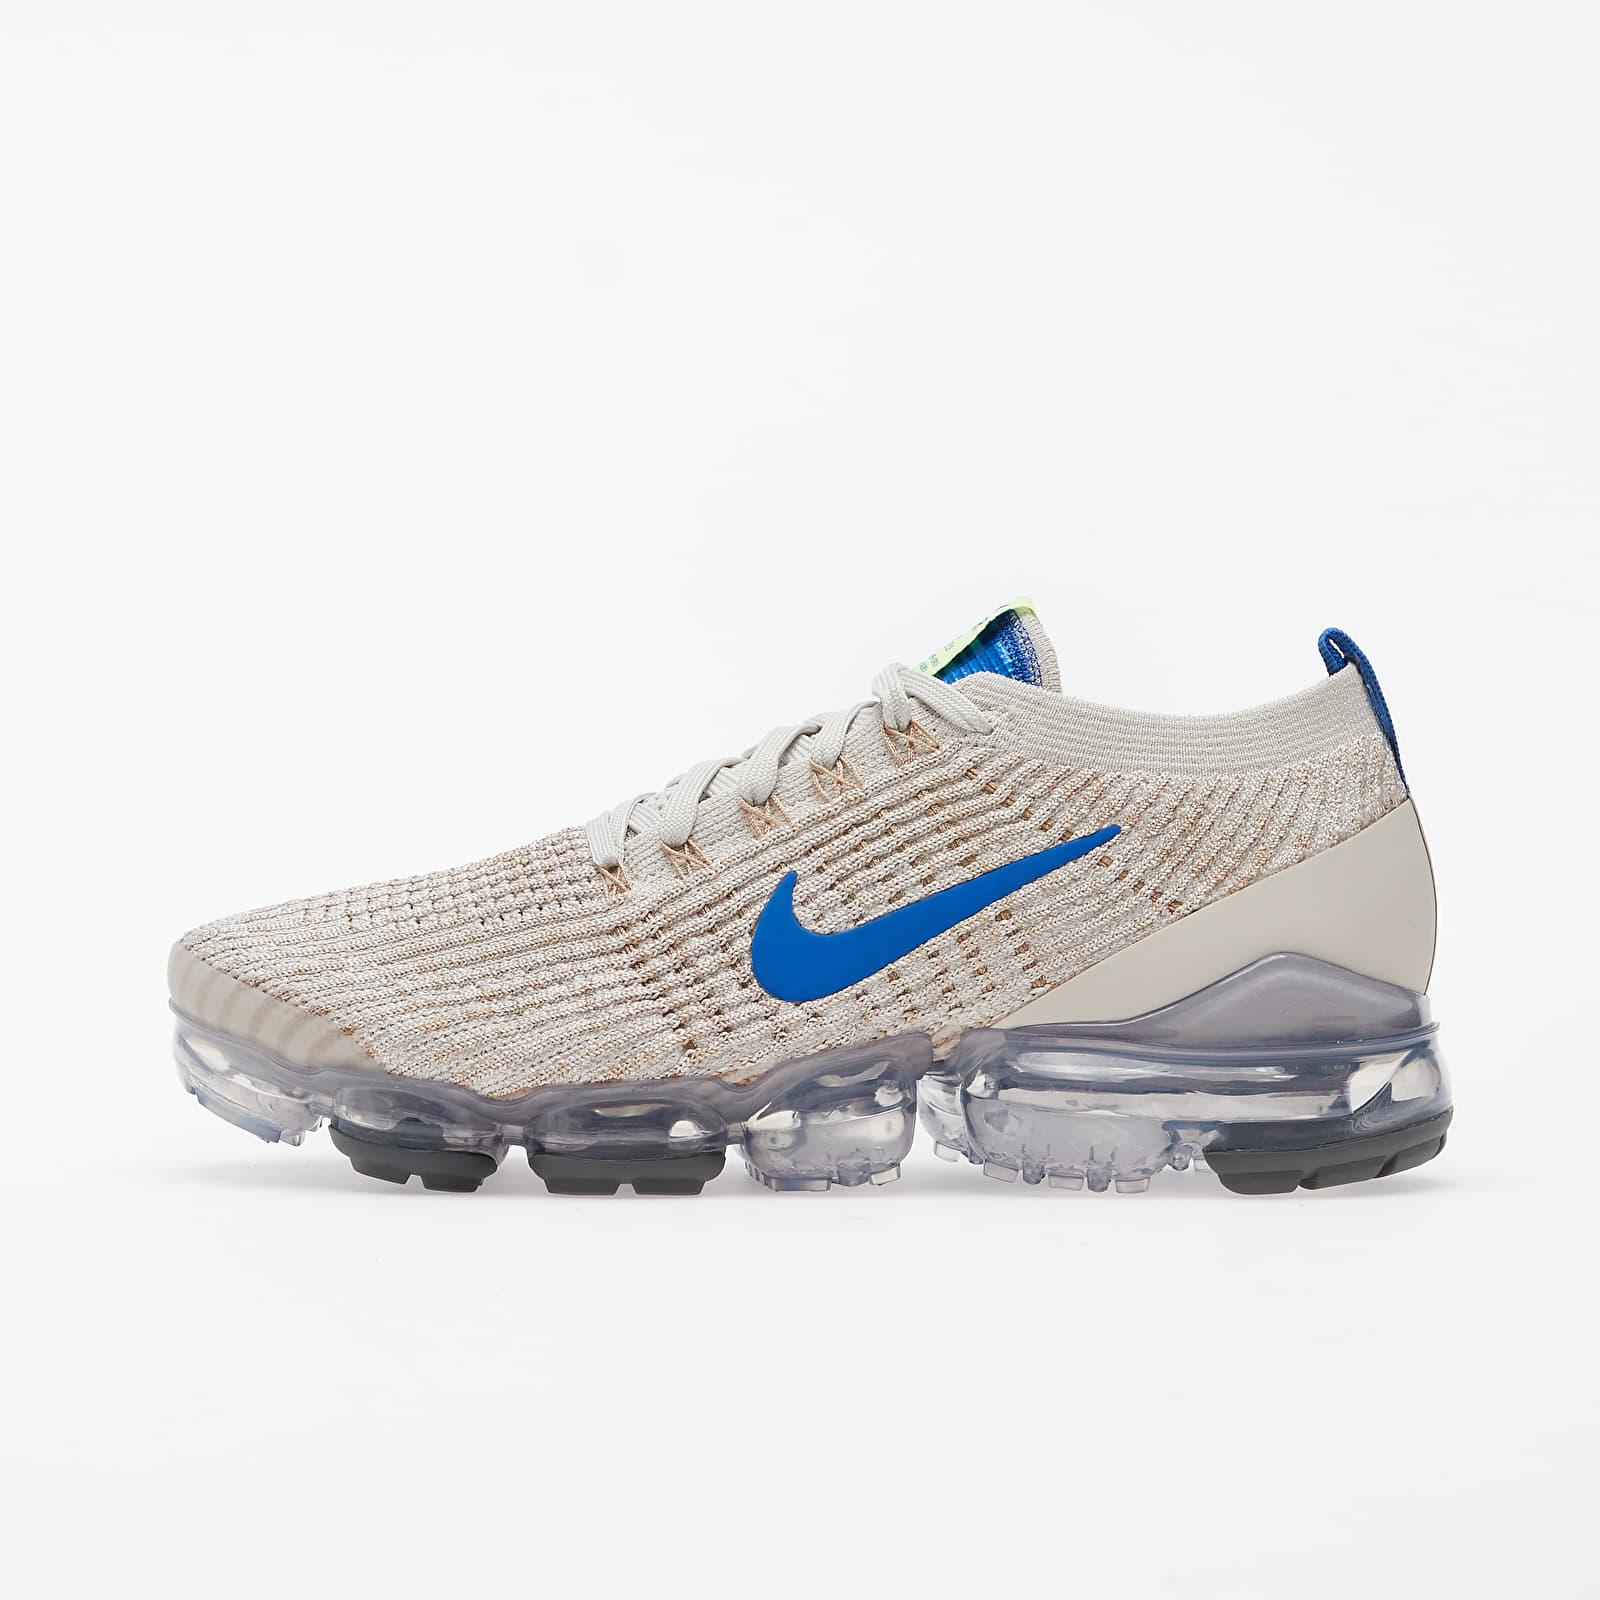 Pánske tenisky a topánky Nike Air Vapormax Flyknit 3 Light Bone/ Game Royal-Khaki-String